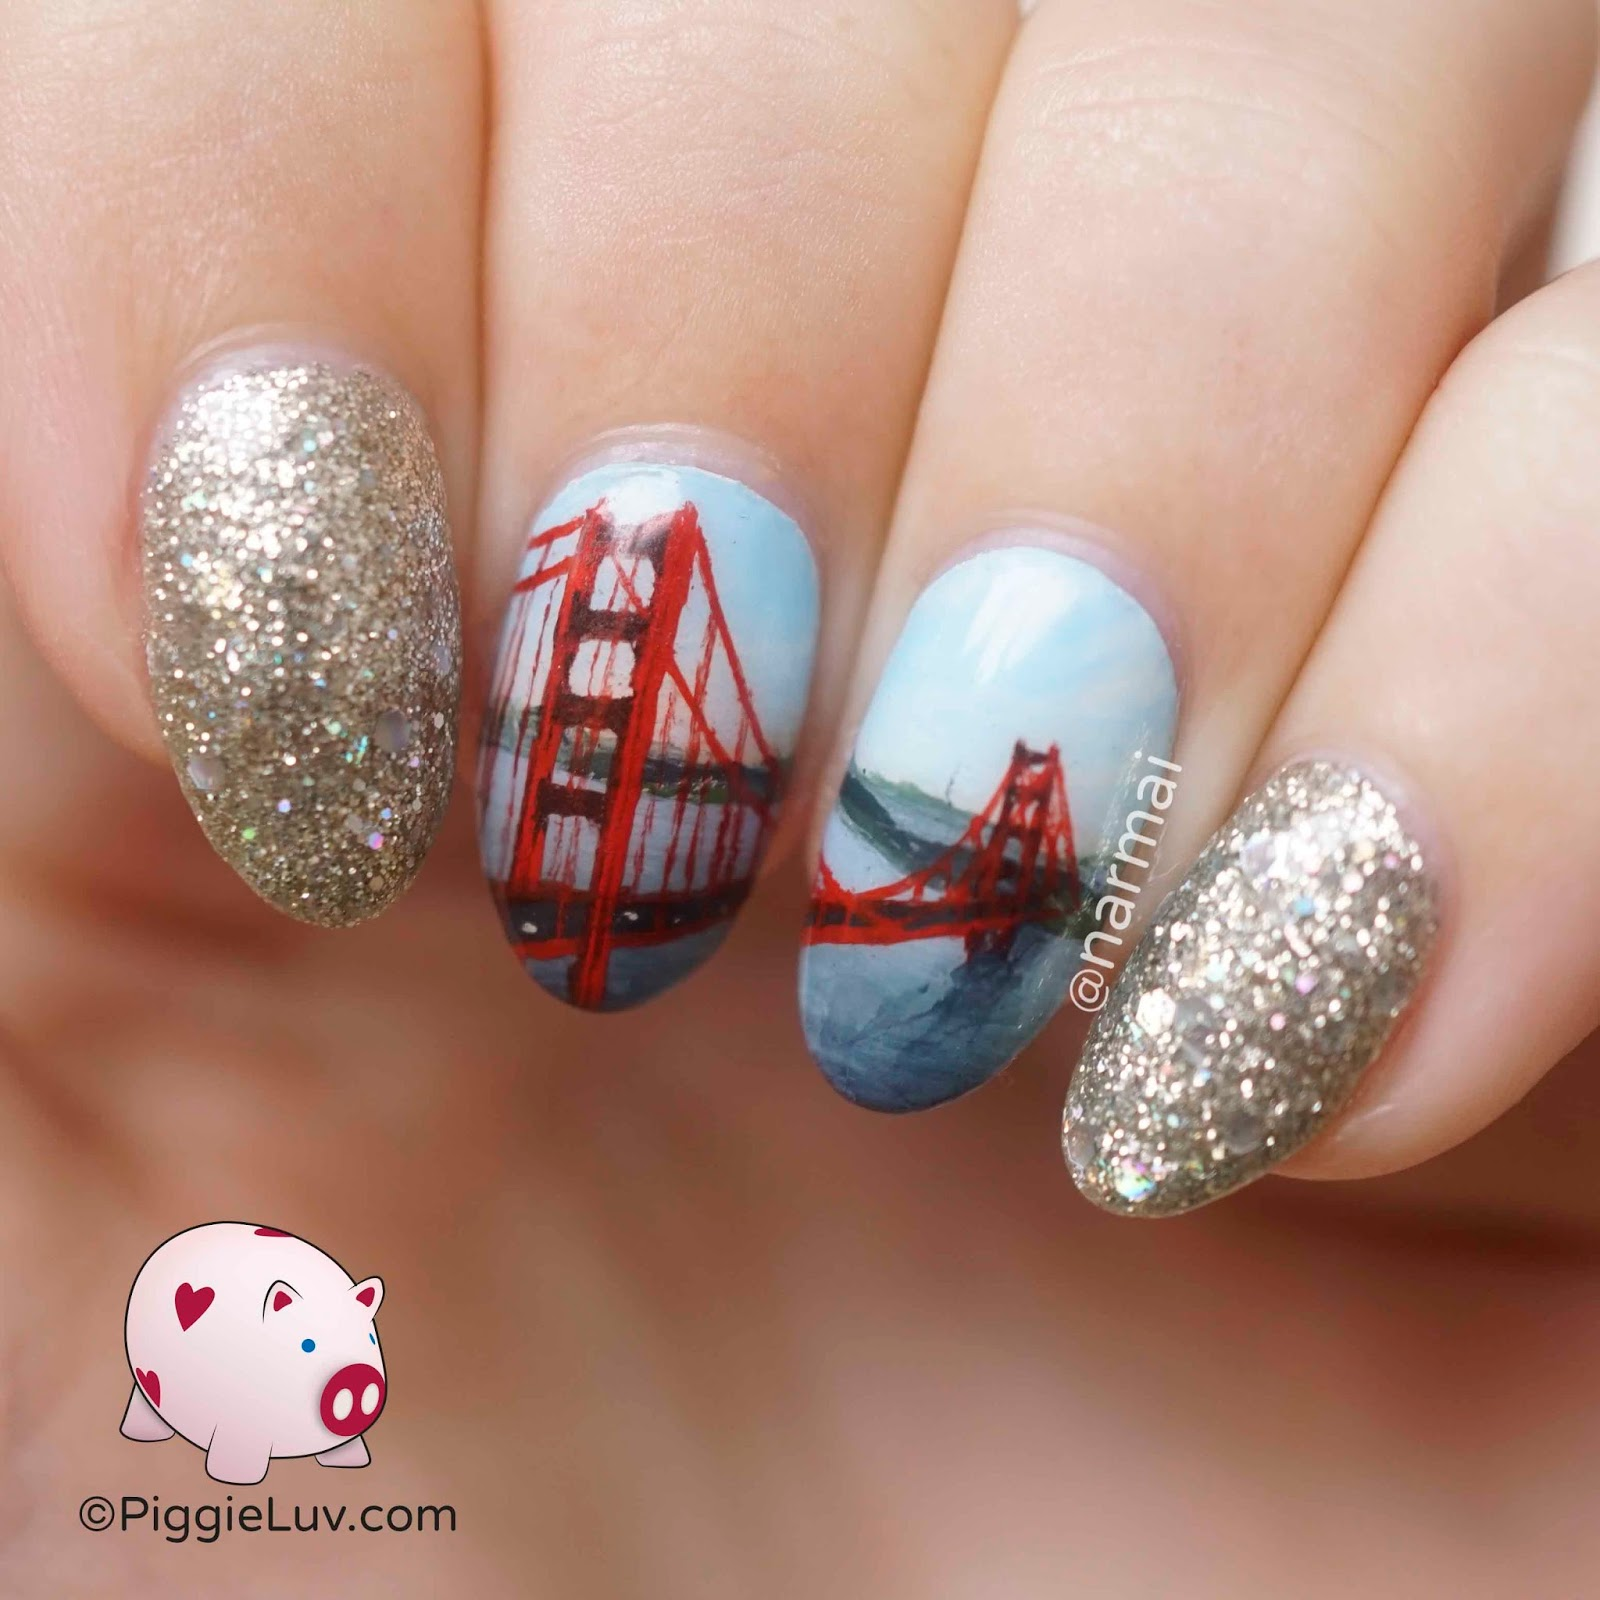 Nail Colors Youtube: PiggieLuv: Golden Gate Bridge Nail Art